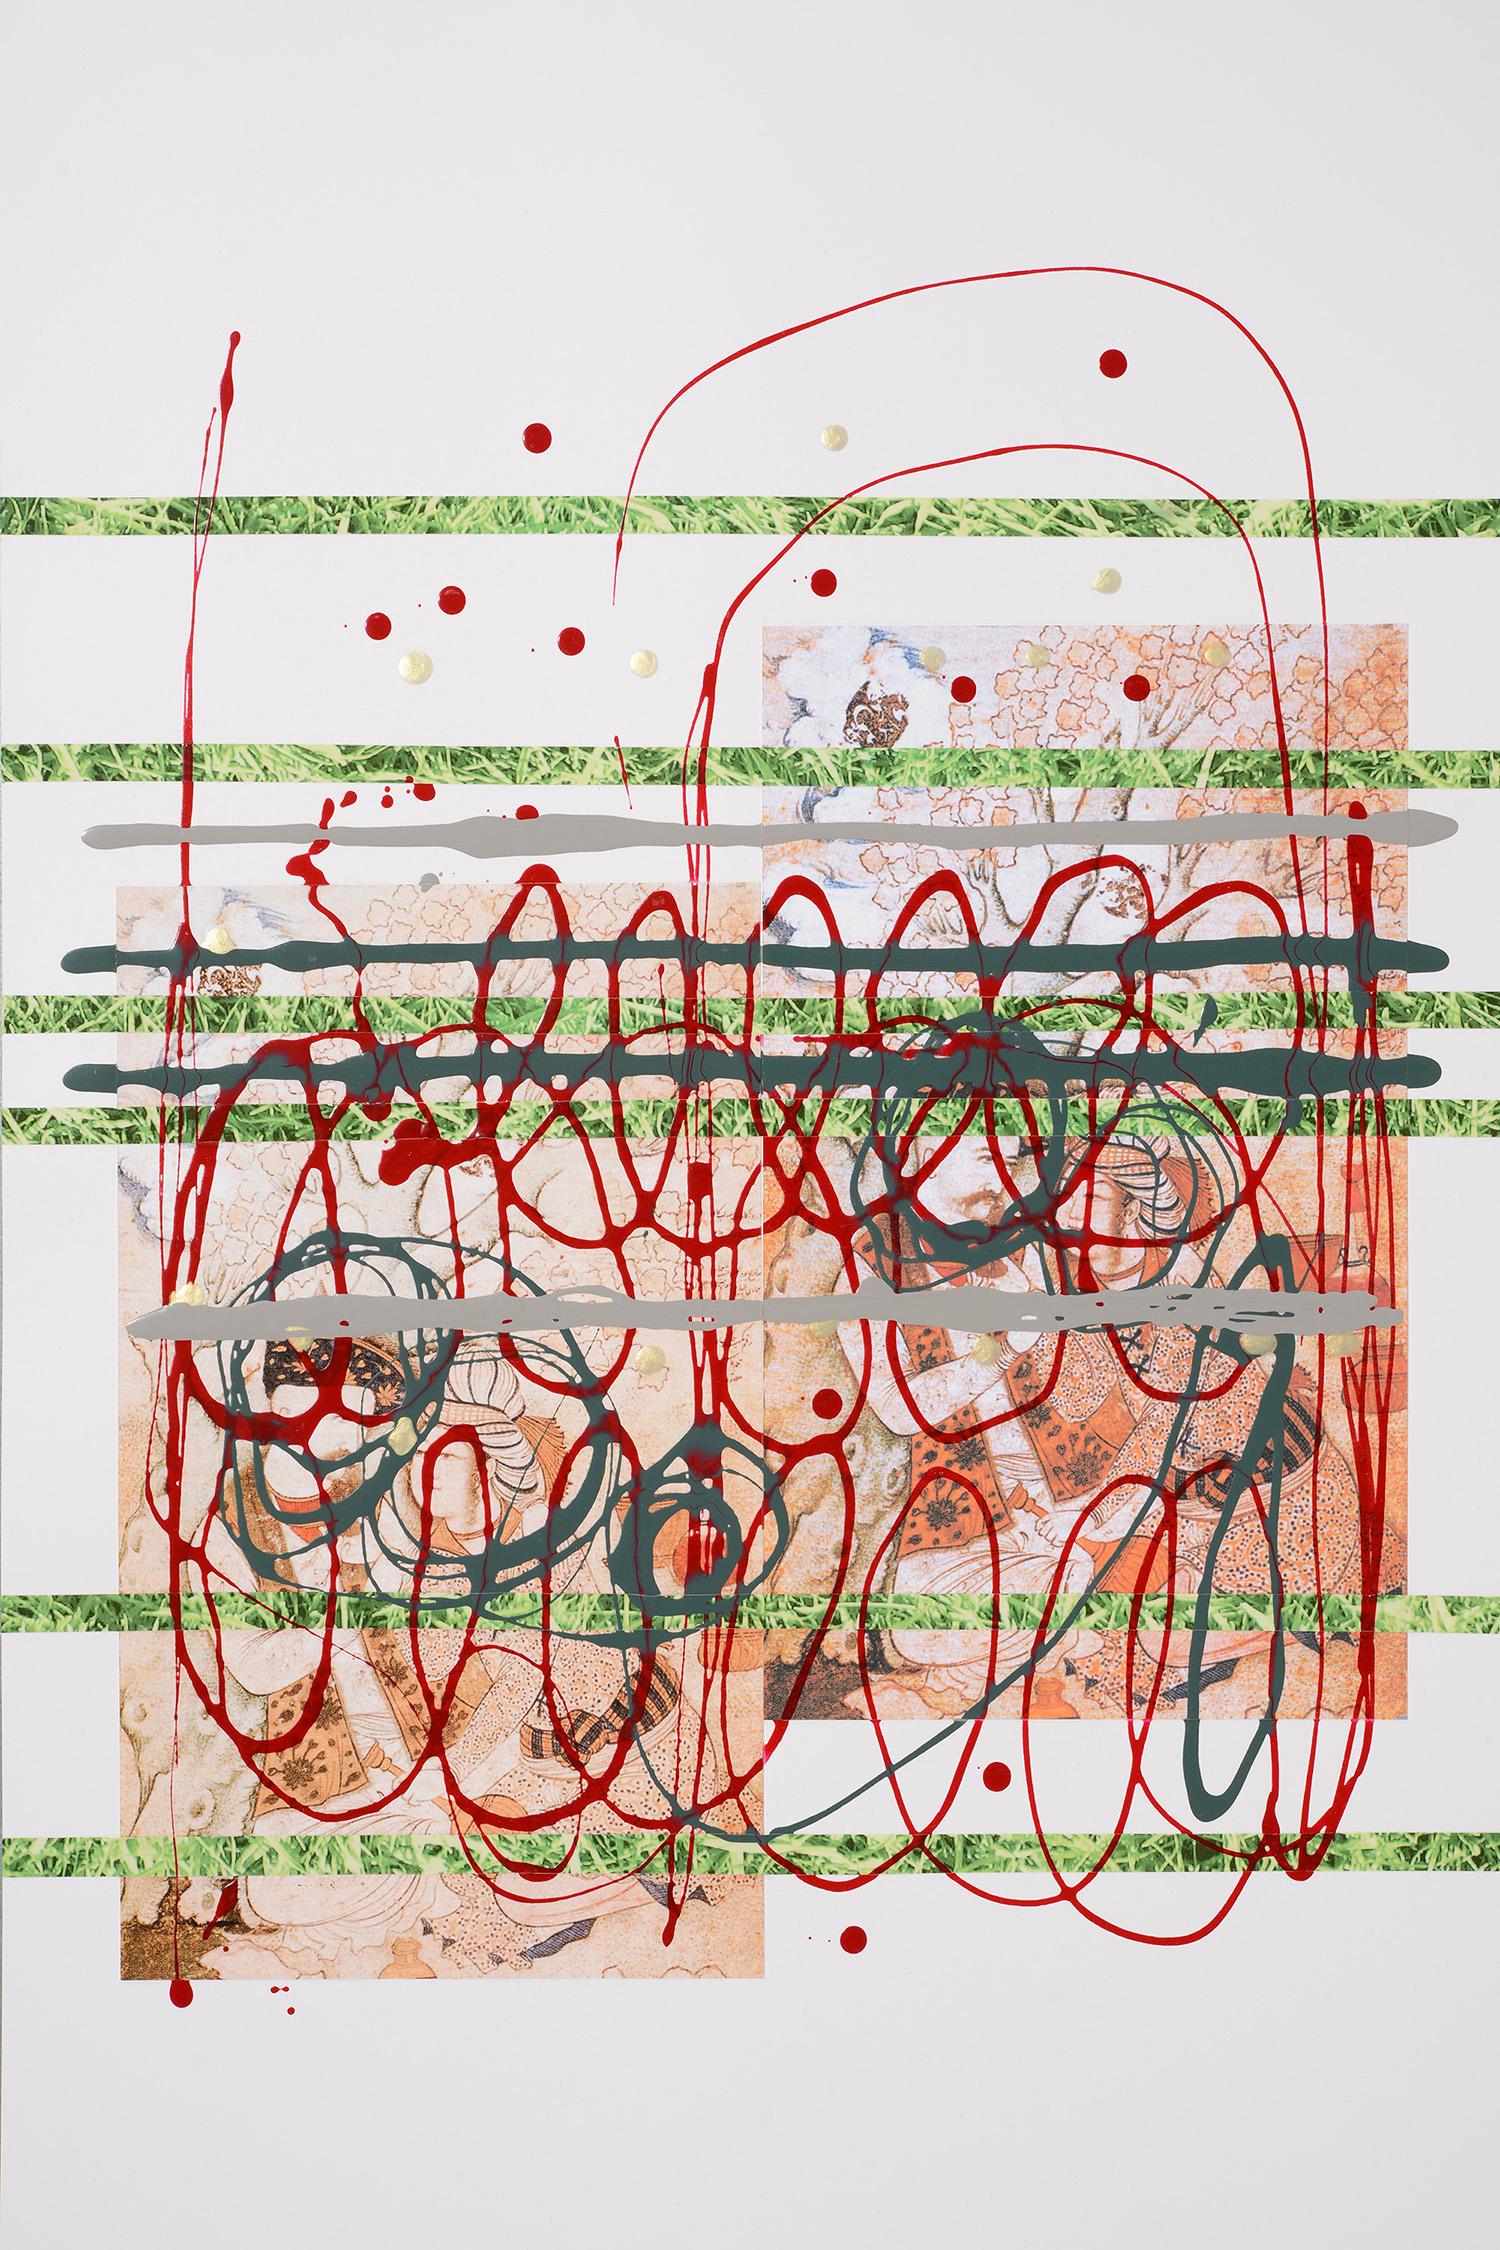 Markues  Secret Rendezvous, 2013  mixed media on paper  60 x 40 cm